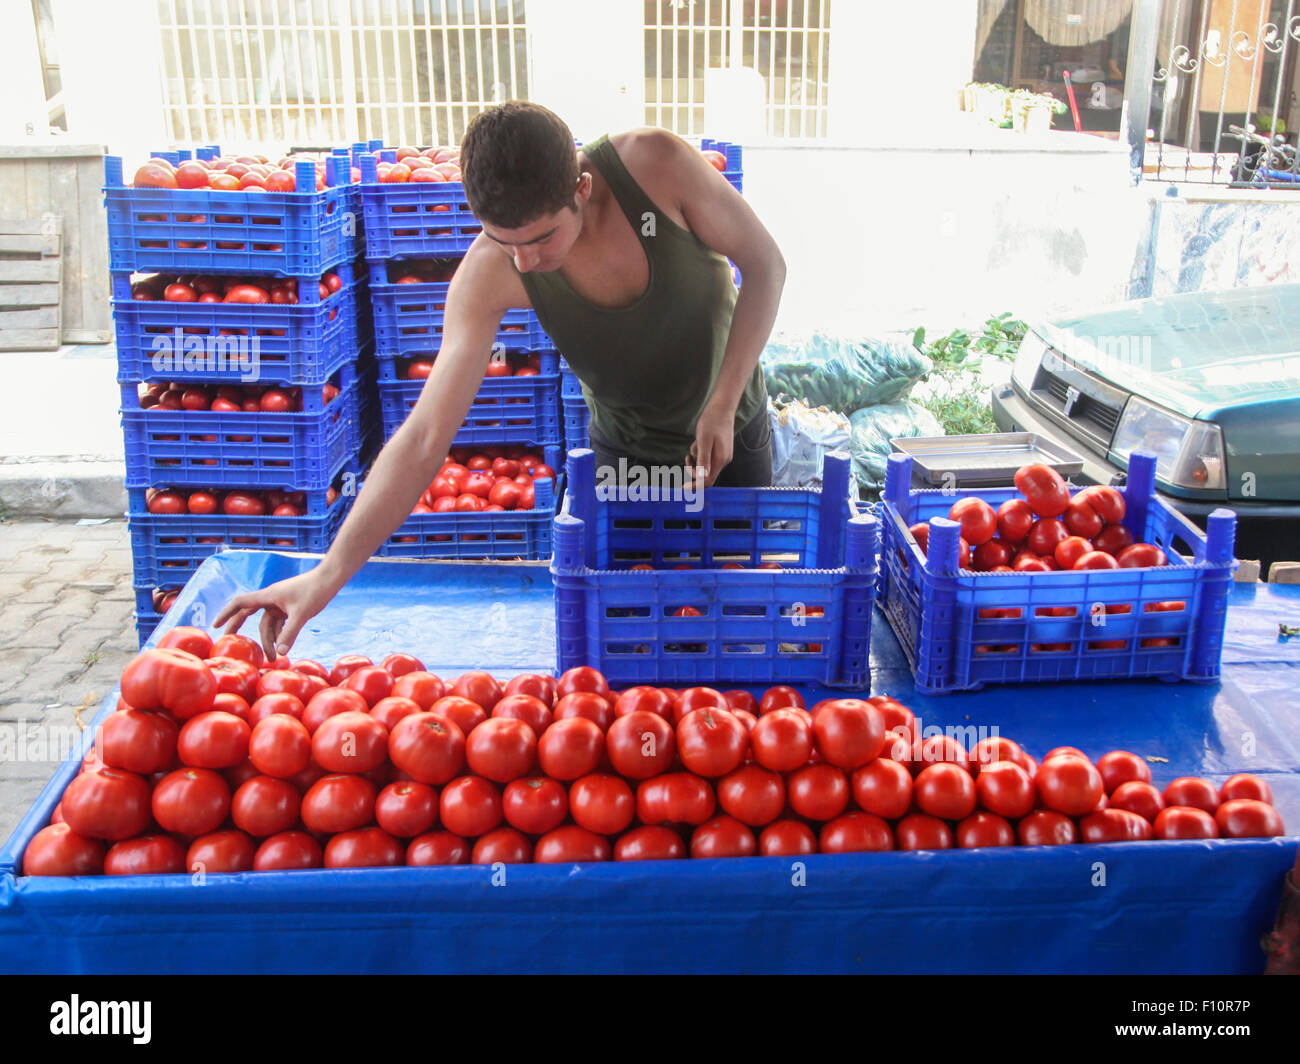 Tomato salesman in Kusadasi, Turkey - Stock Image